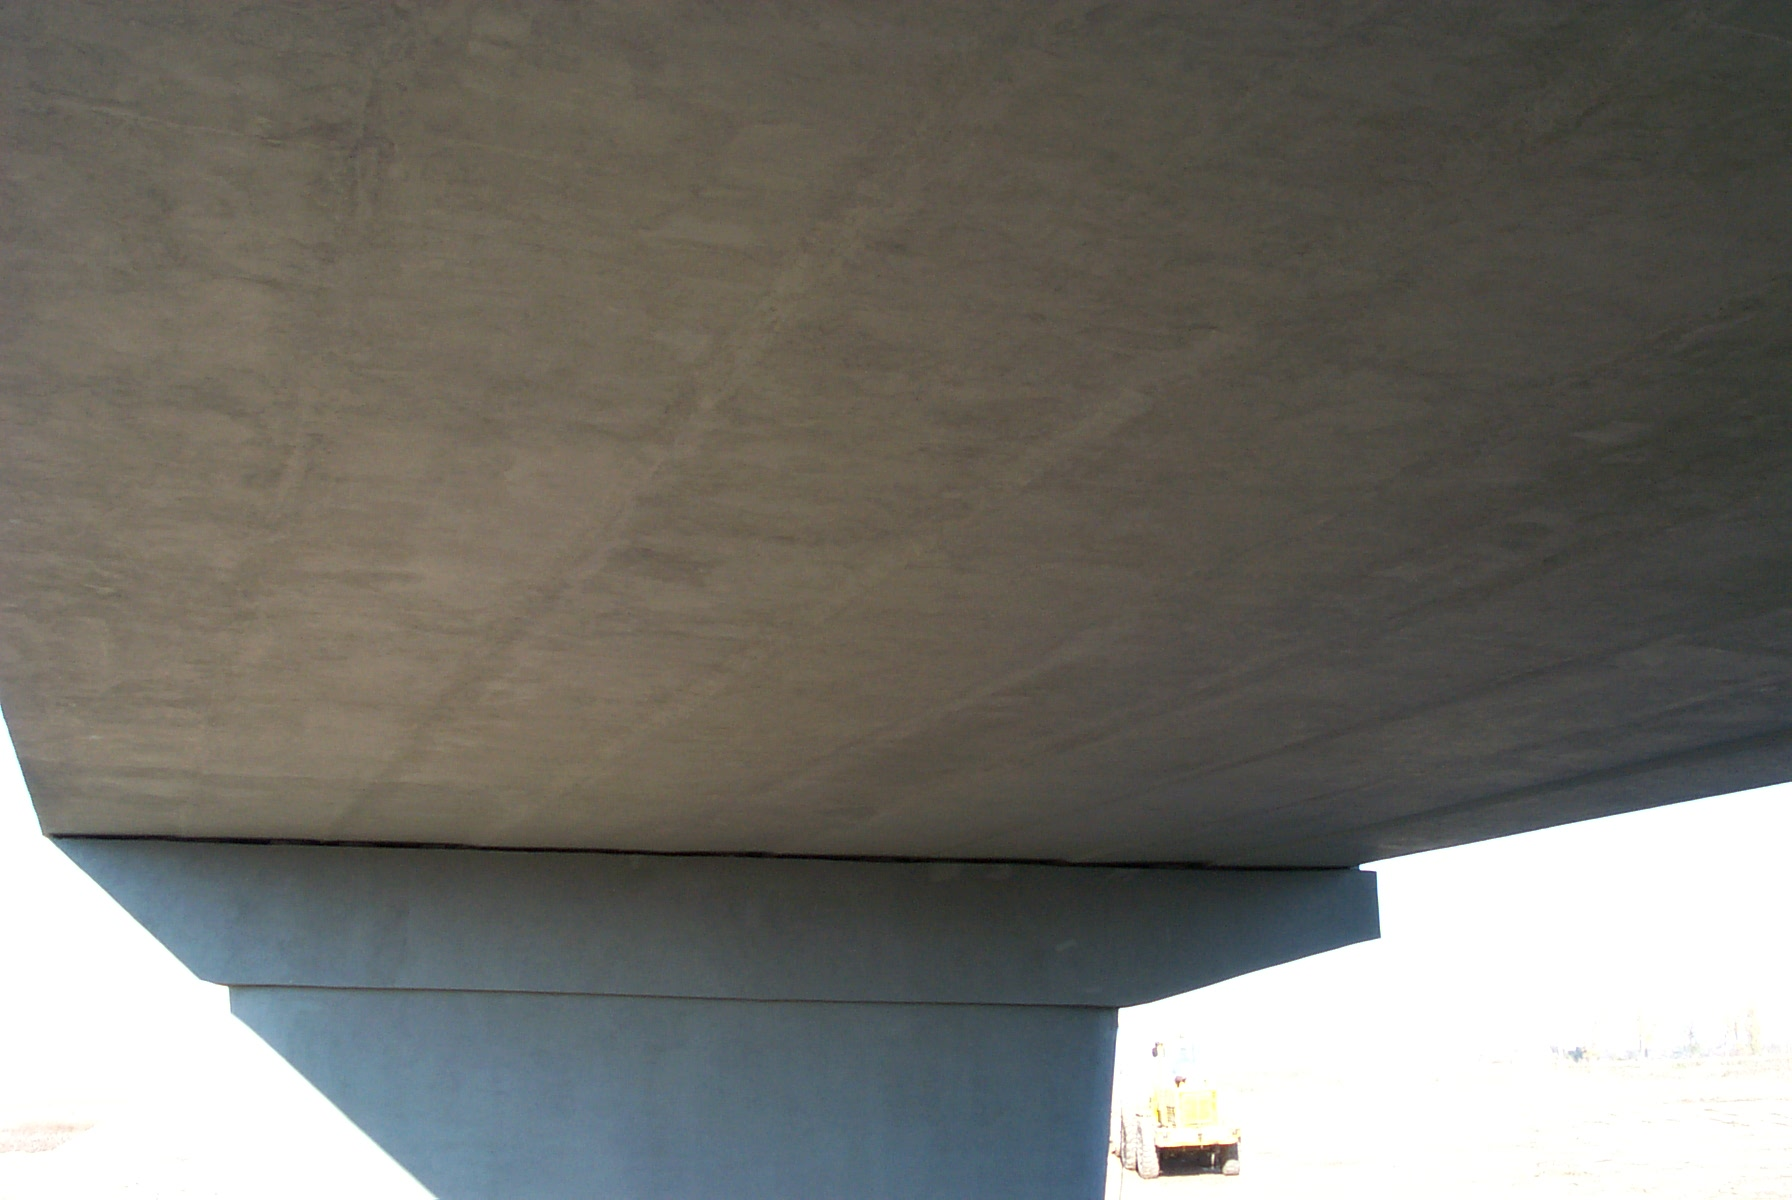 Reparatii pod (DN2), Km. 33 - 028, peste raul Calnistea MAPEI - Poza 120